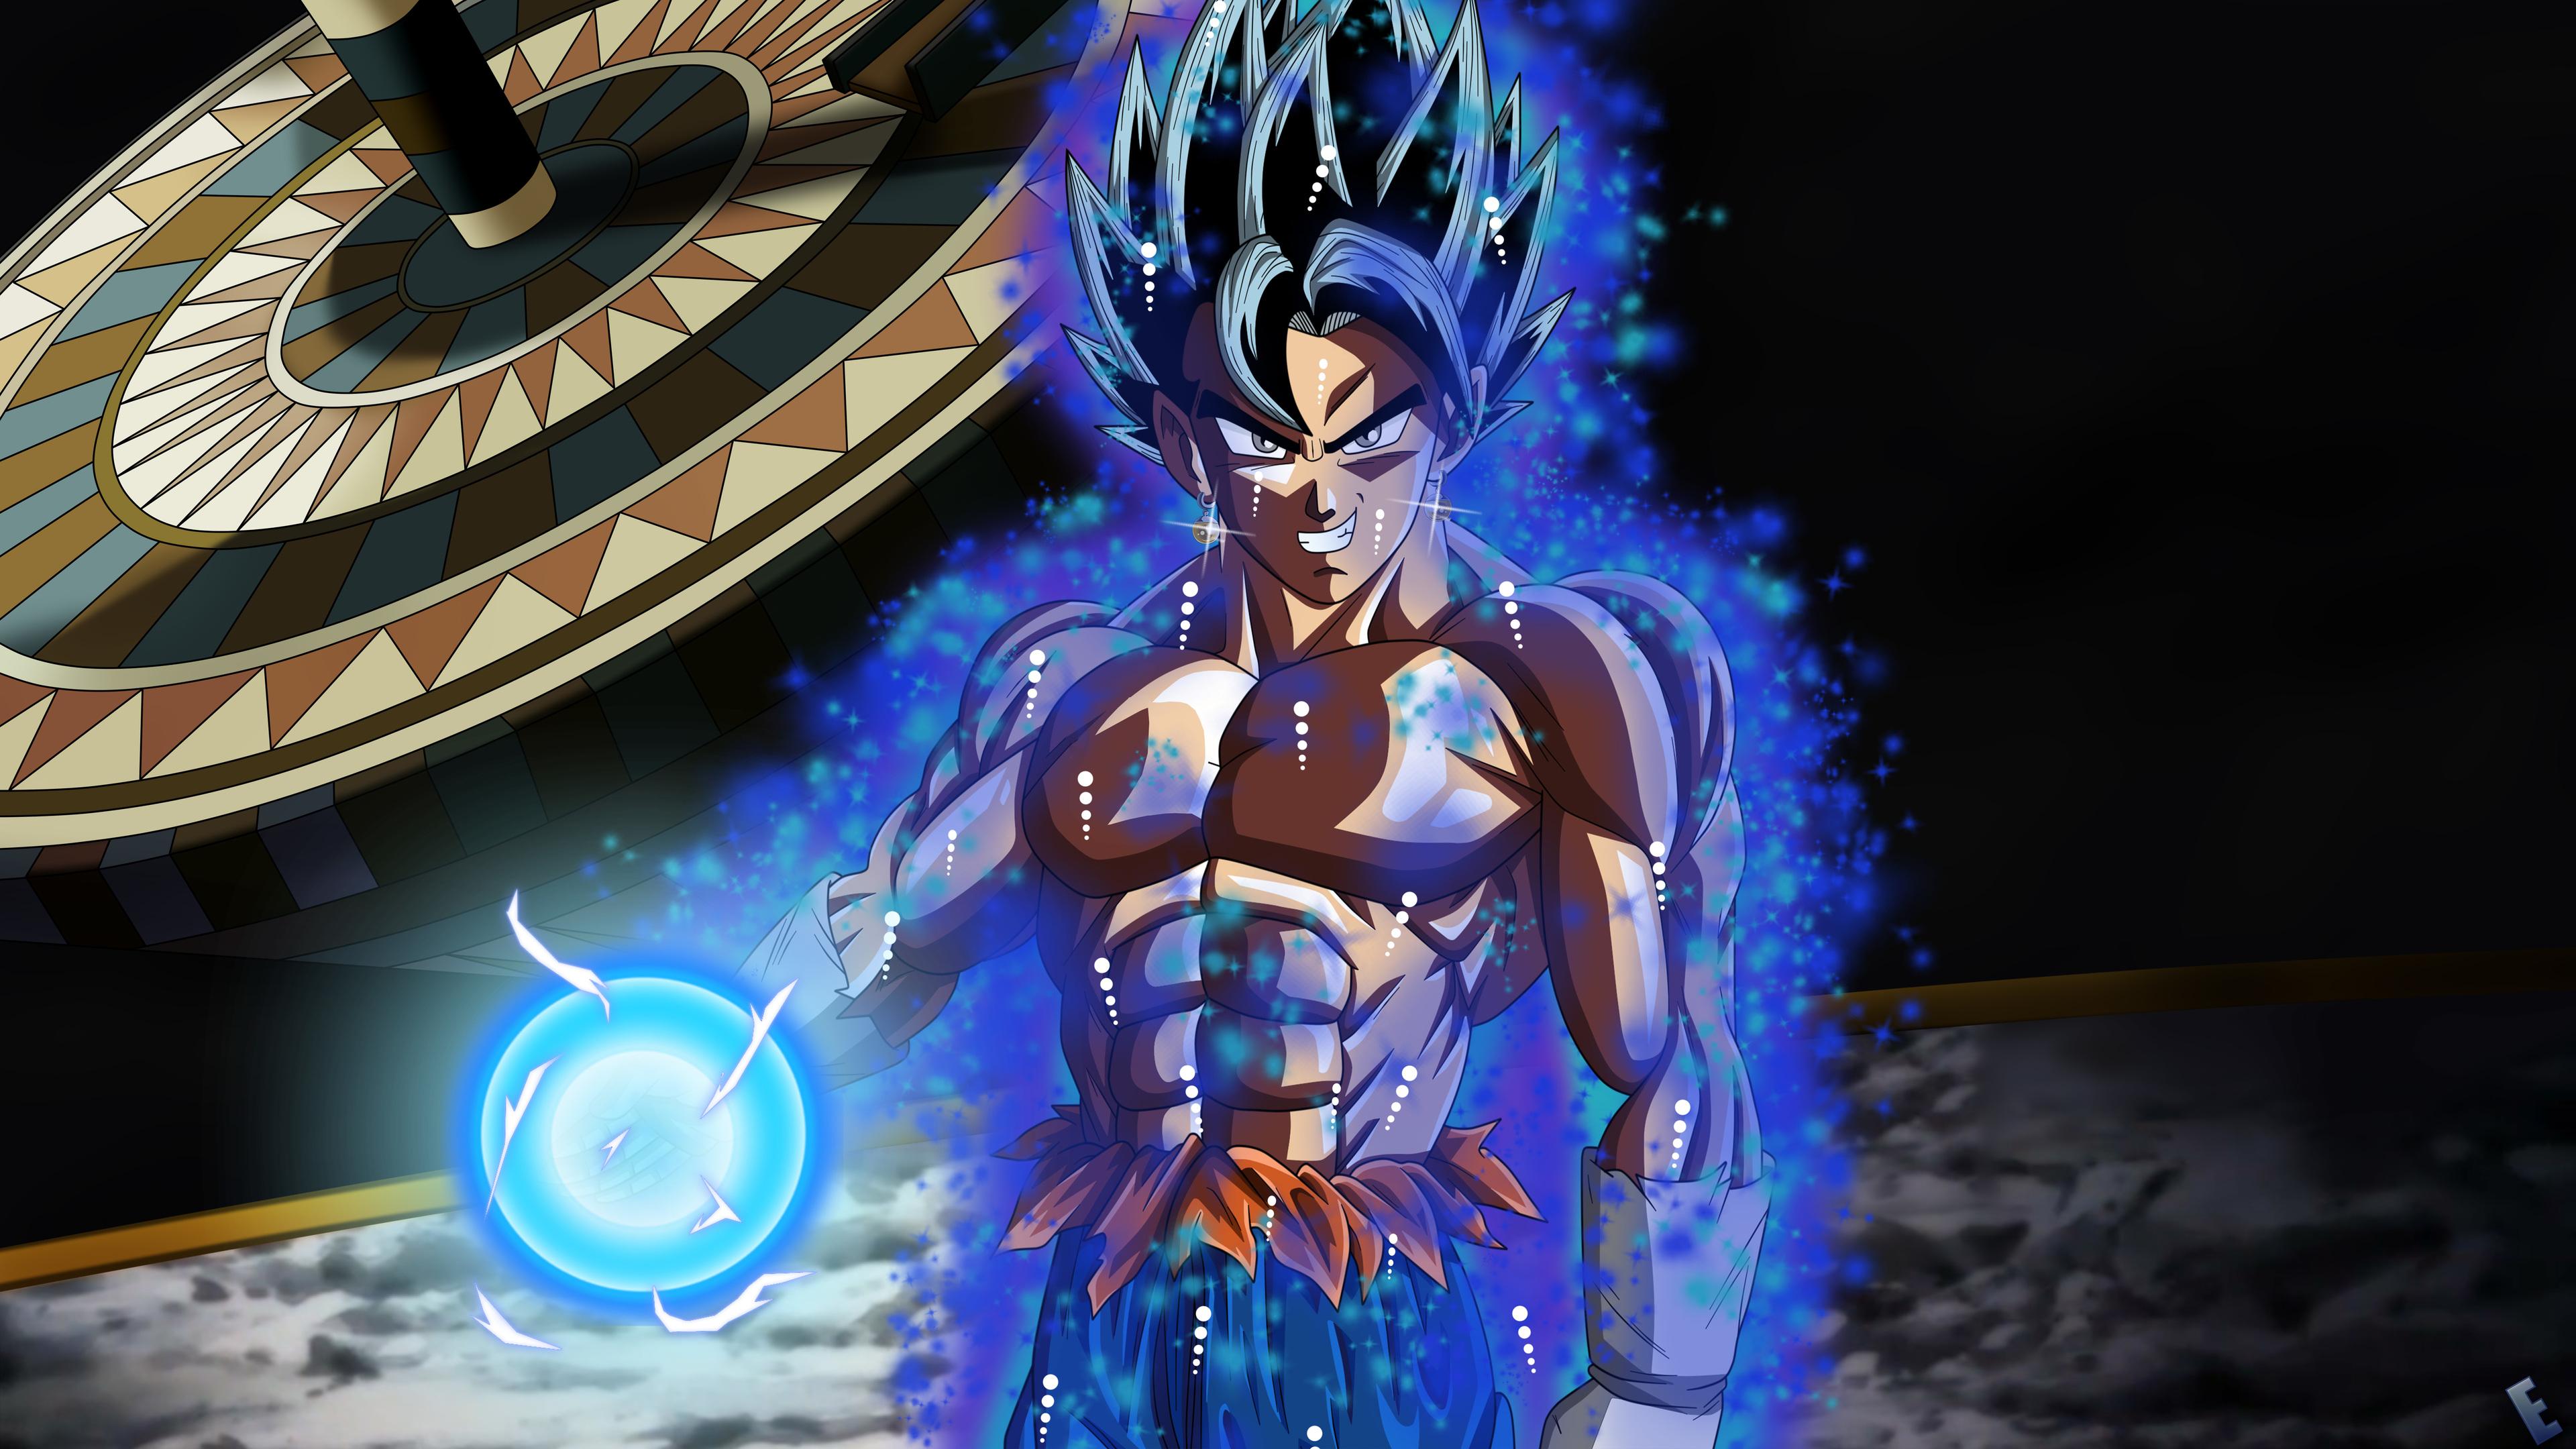 goku dragon ball super 8k 1541973693 - Goku Dragon Ball Super 8k - hd-wallpapers, goku wallpapers, dragon ball wallpapers, dragon ball super wallpapers, digital art wallpapers, artwork wallpapers, artist wallpapers, anime wallpapers, 8k wallpapers, 5k wallpapers, 4k-wallpapers